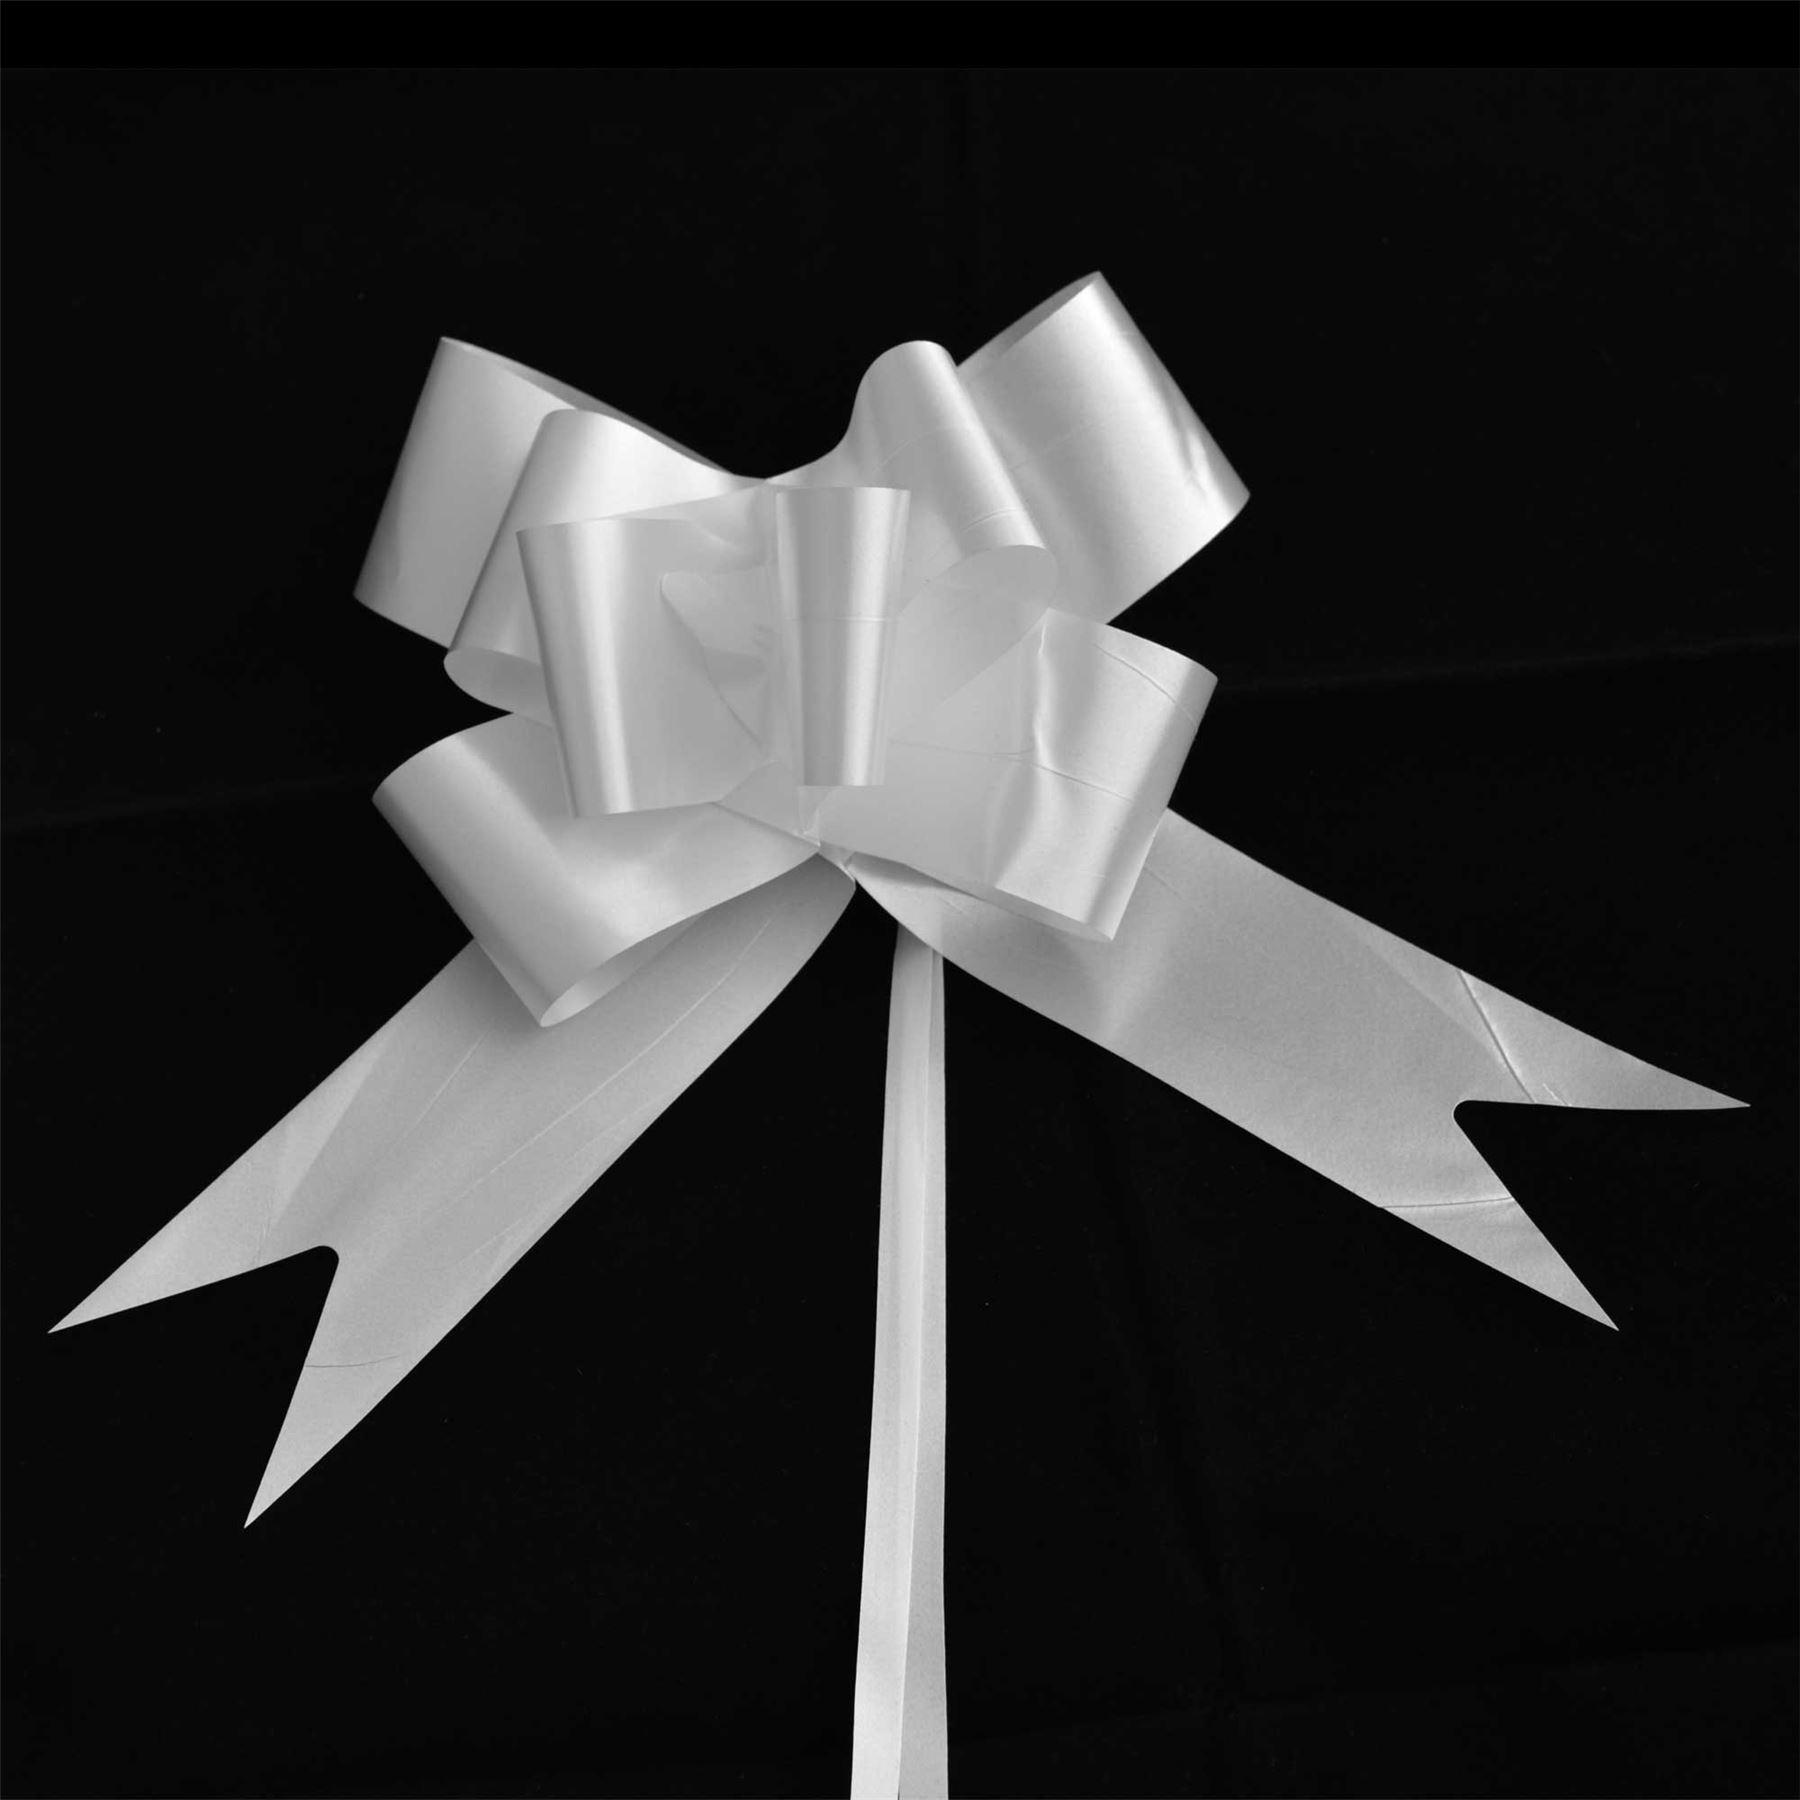 30mm Pull Bows Wedding Hampers Car Gift Wrap Ribbon Florist Pew Xmas Decorations